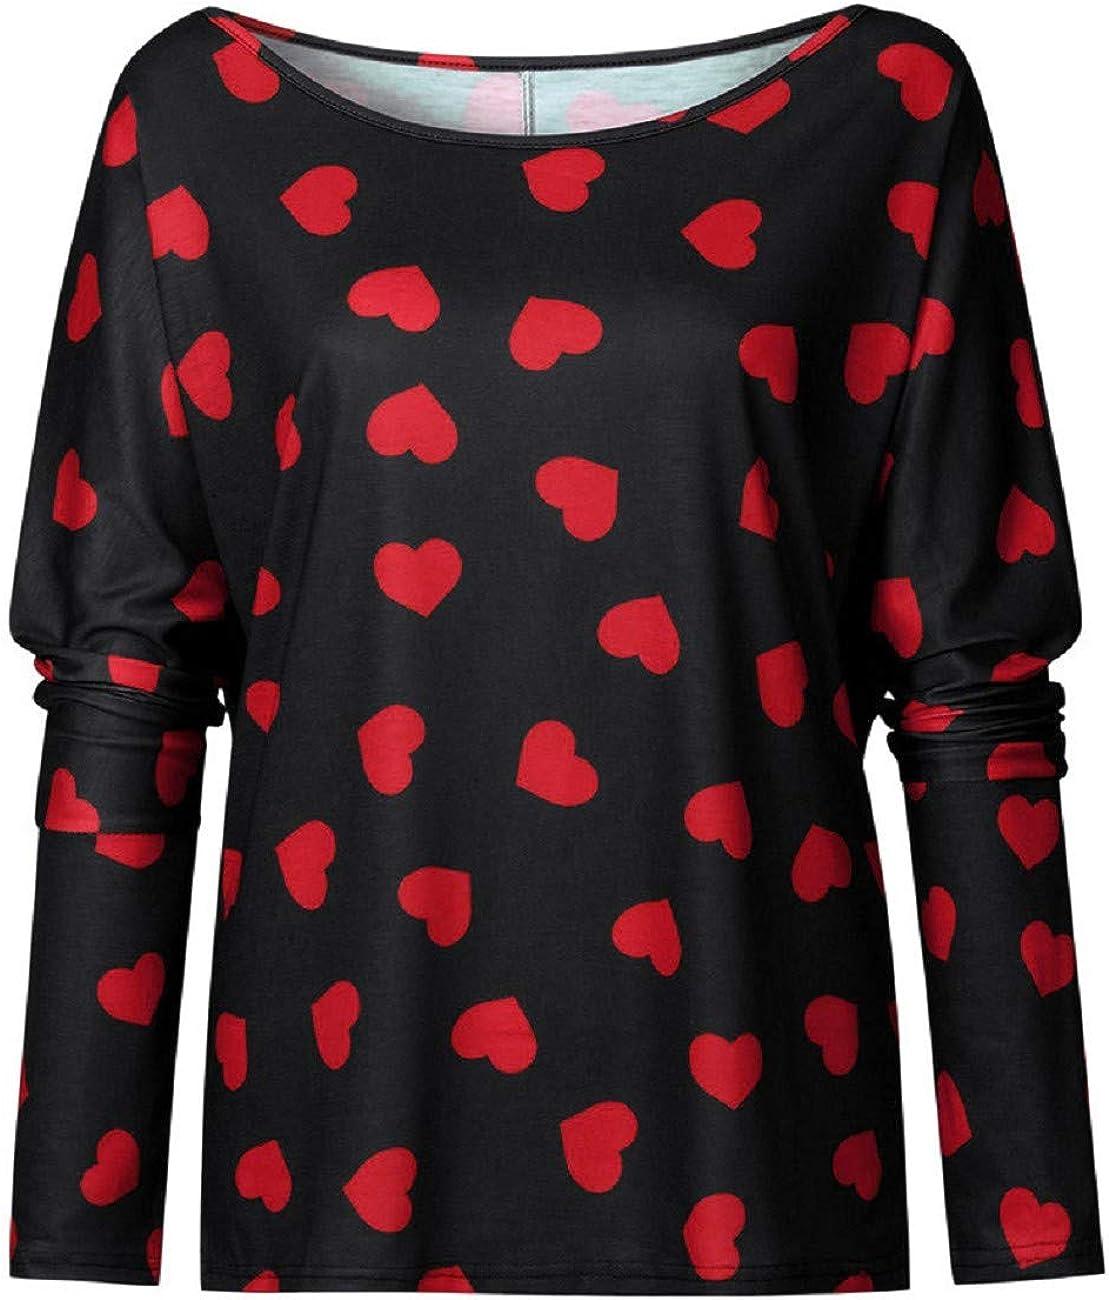 FAPIZI Womens Pullover Tunic Top Long Sleeve Heart Prints Blouse Off Shoulder Valentines T Shirt Sweatshirt